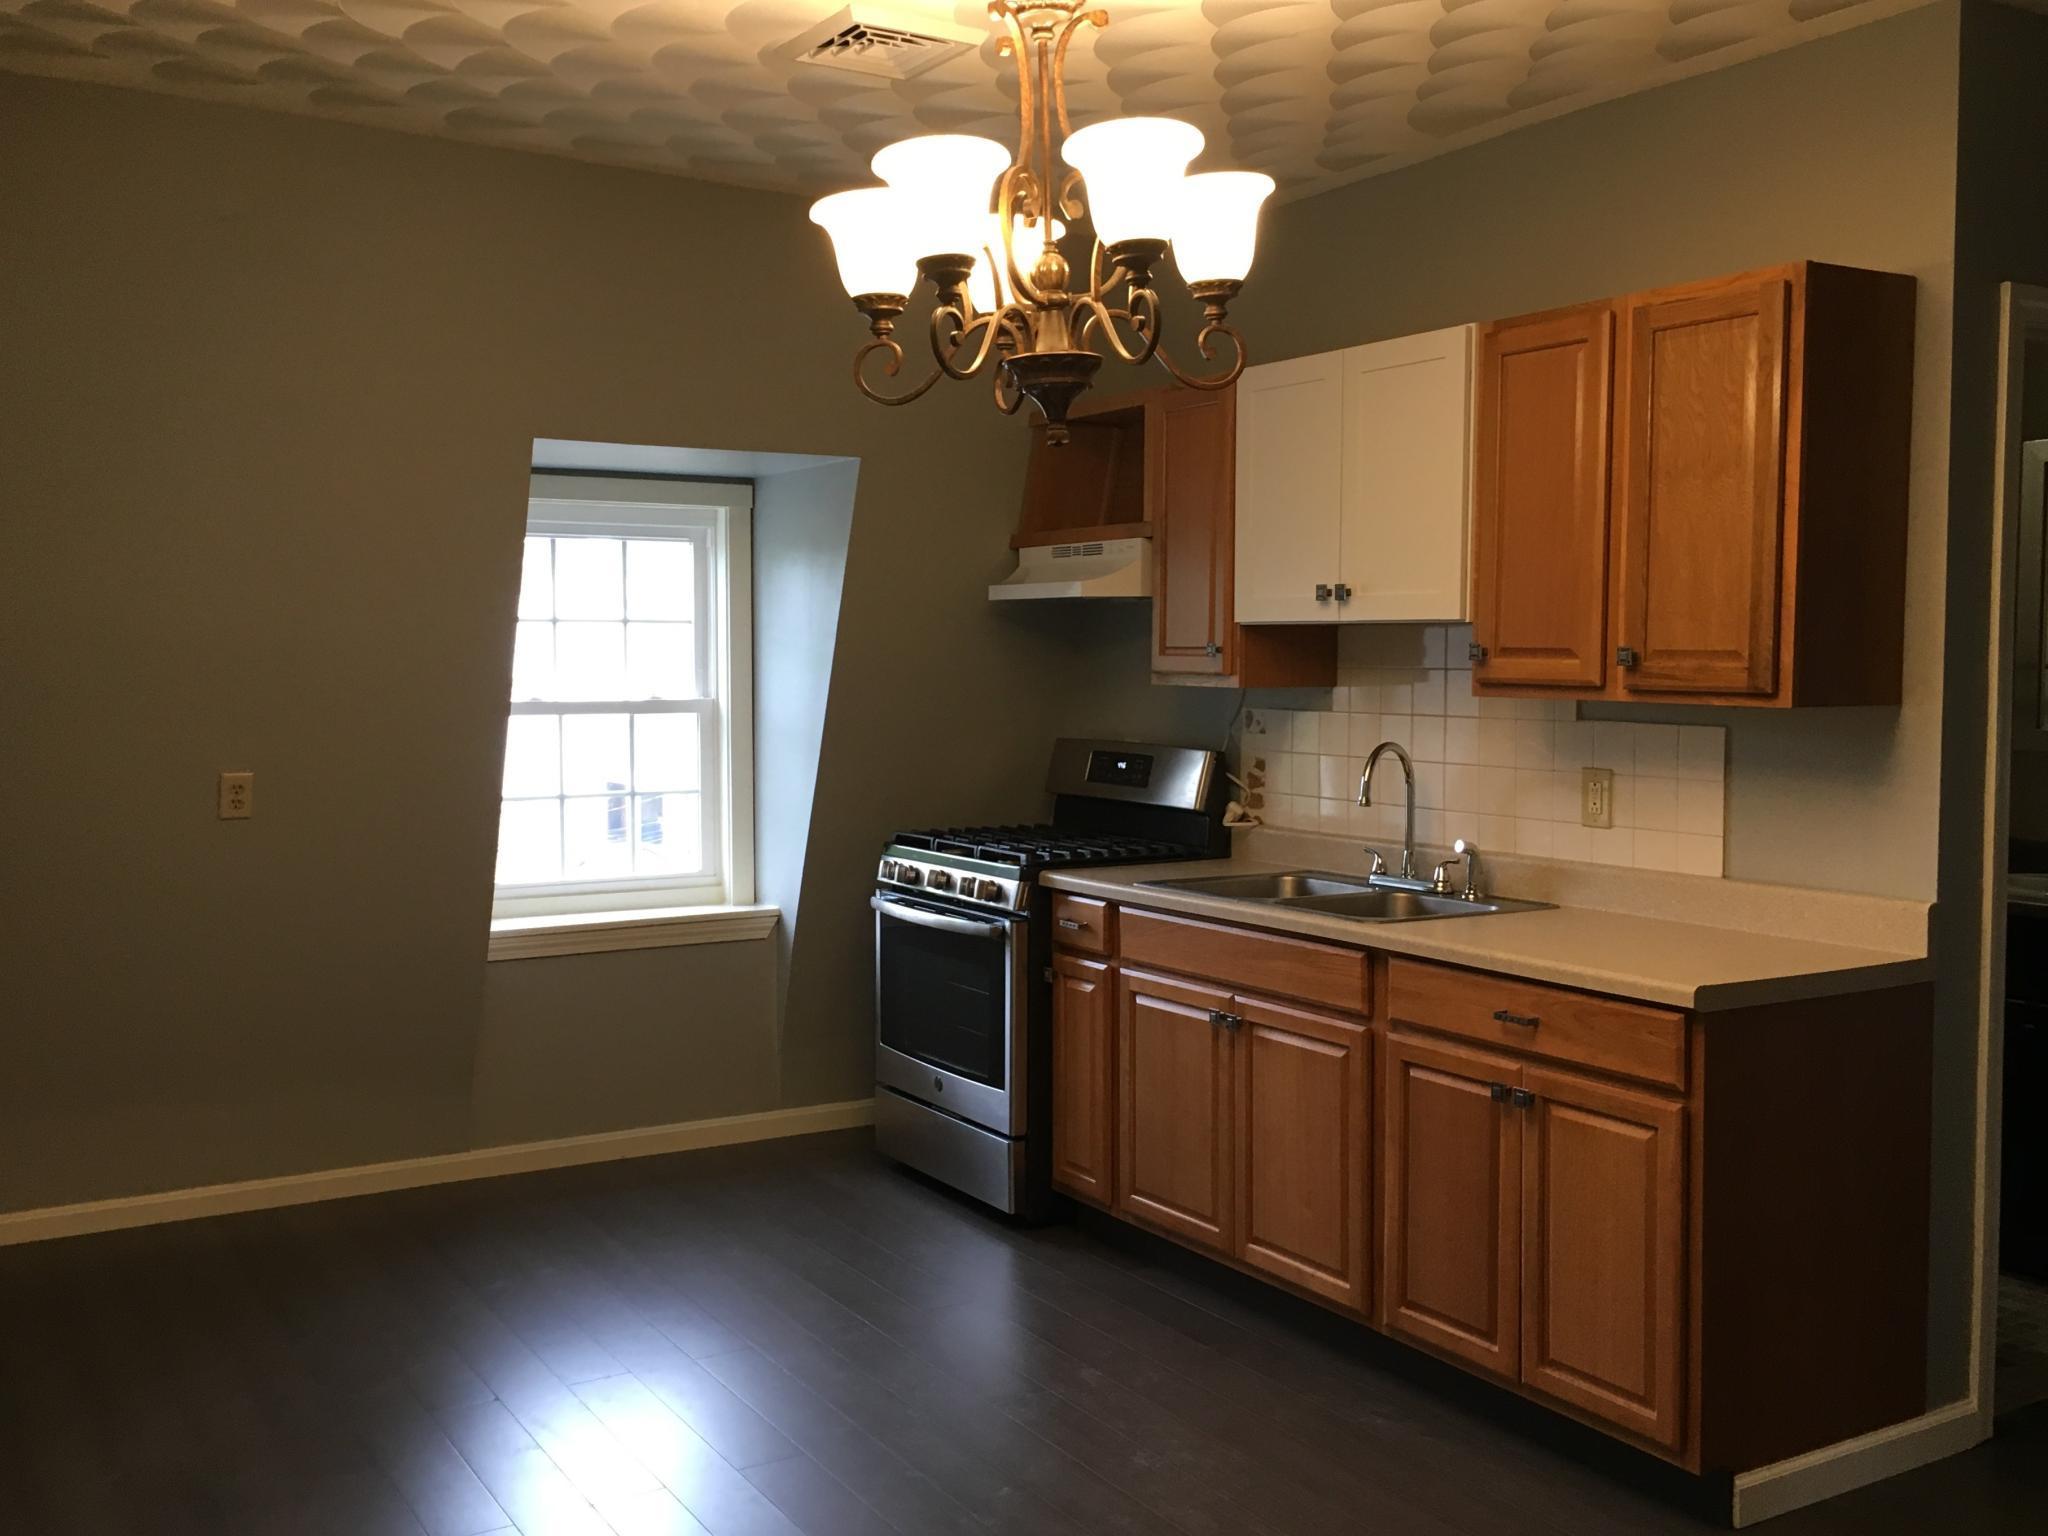 186 John St #3S, Fall River, MA 02721 For Rent   Trulia